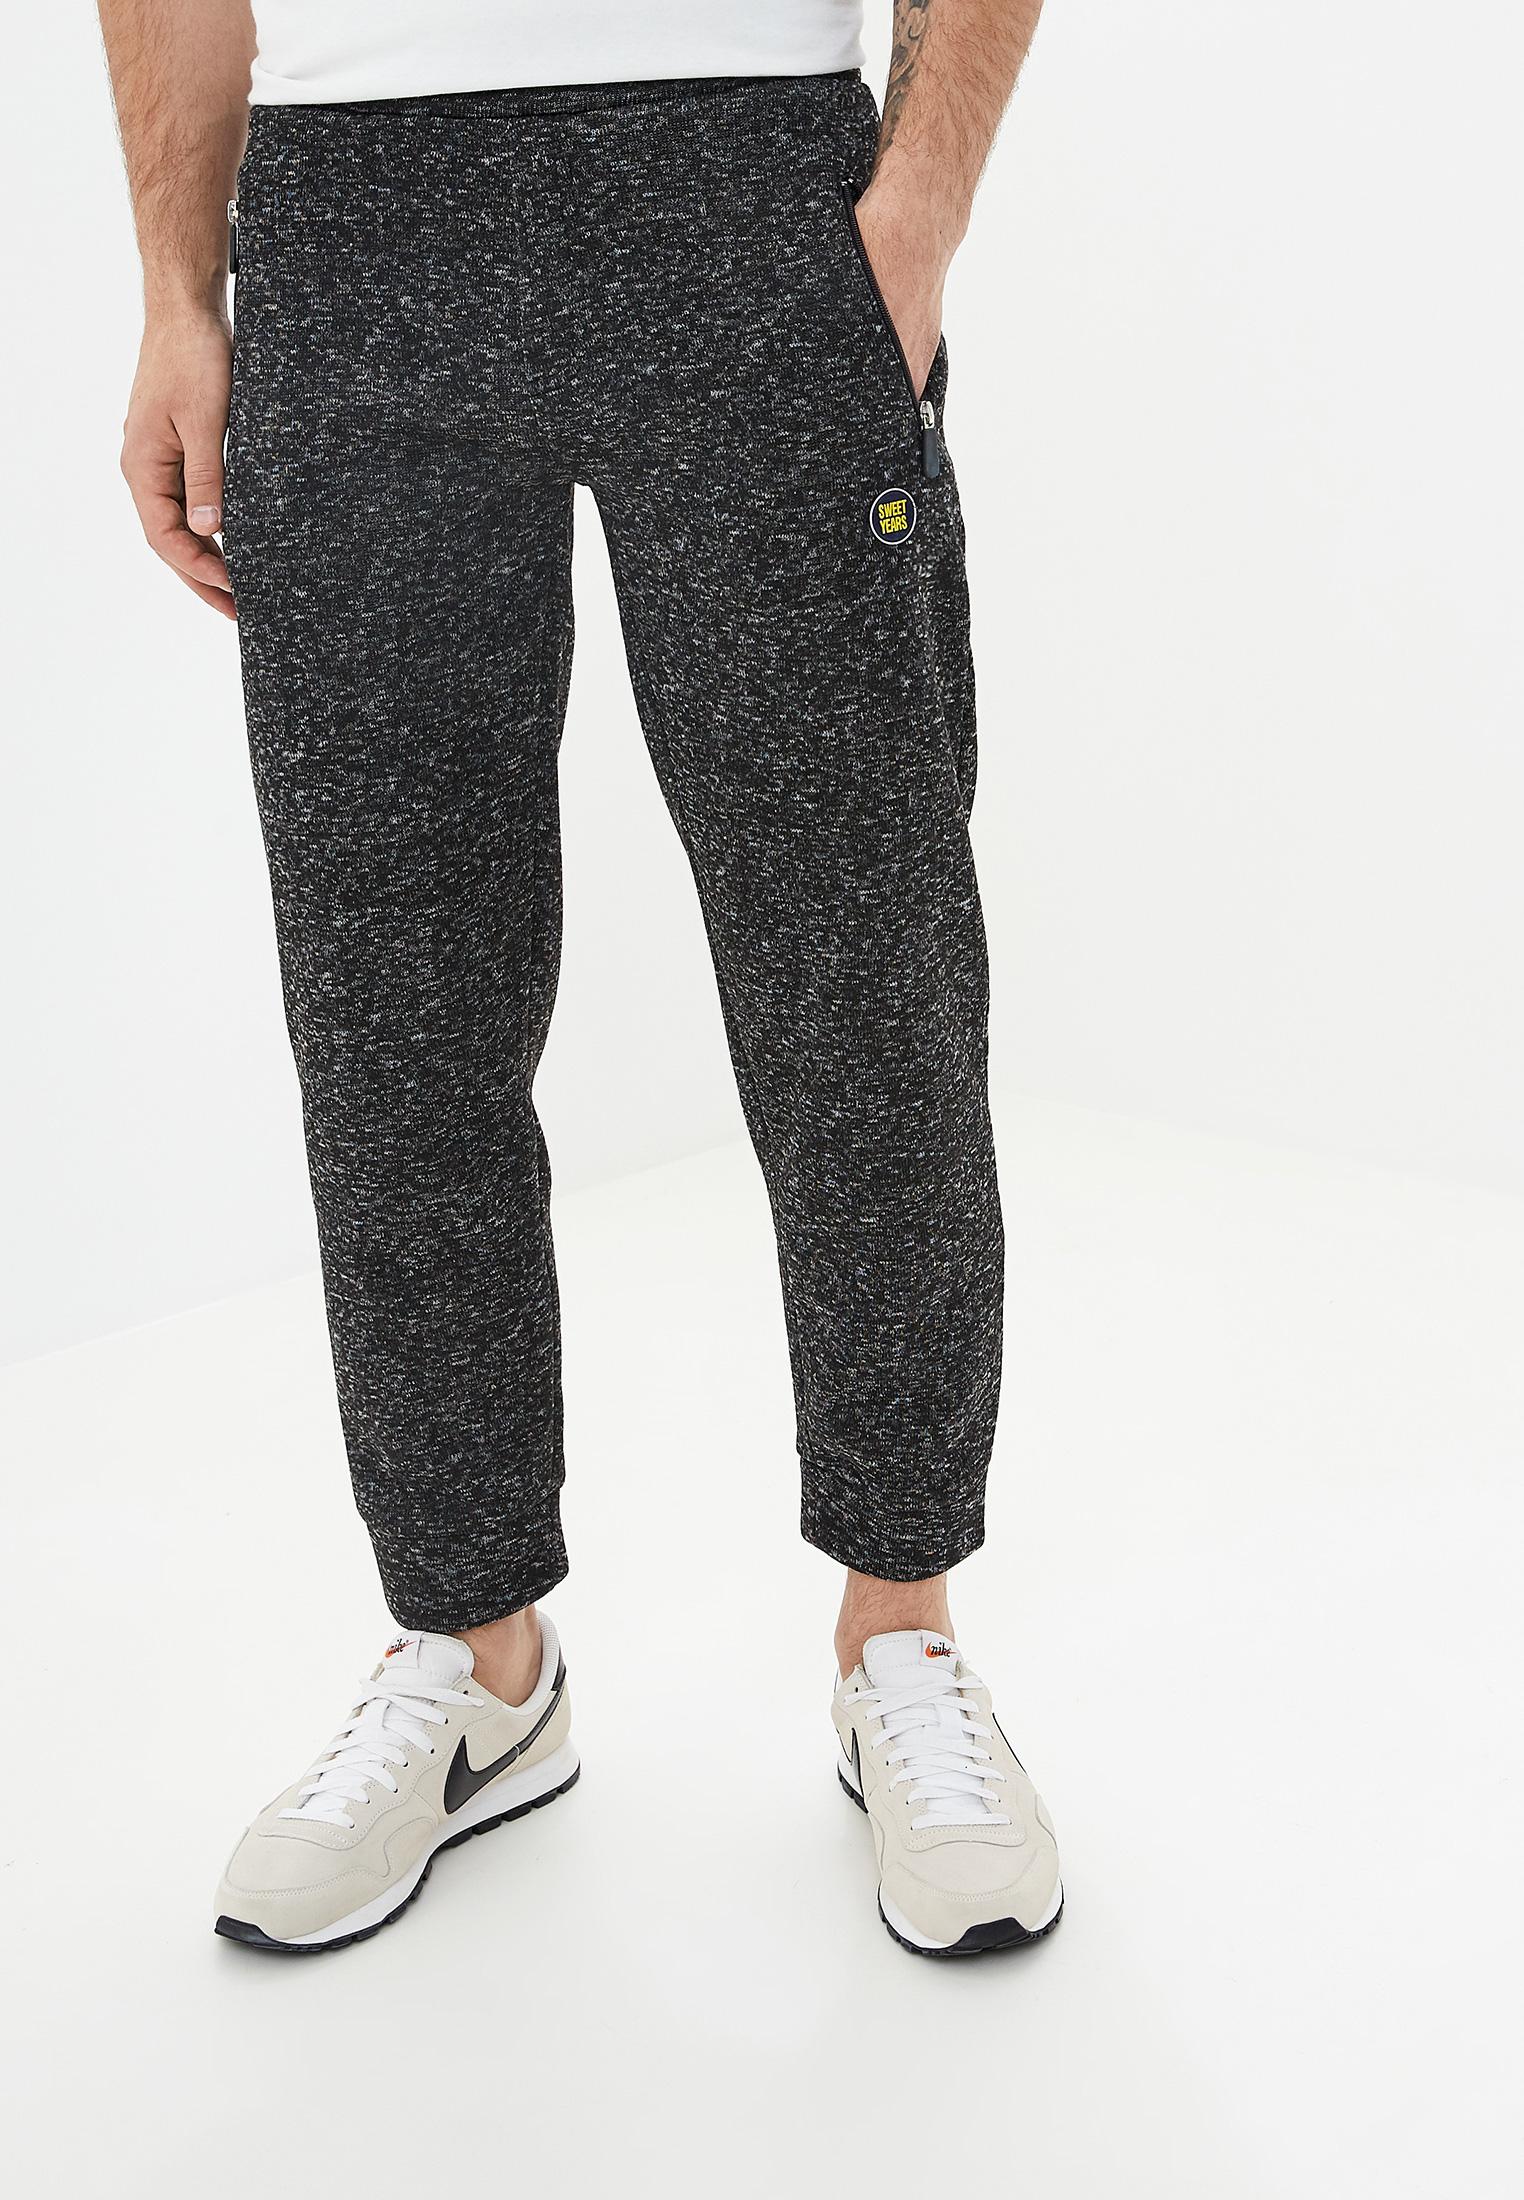 Мужские спортивные брюки Sweet years 4150S